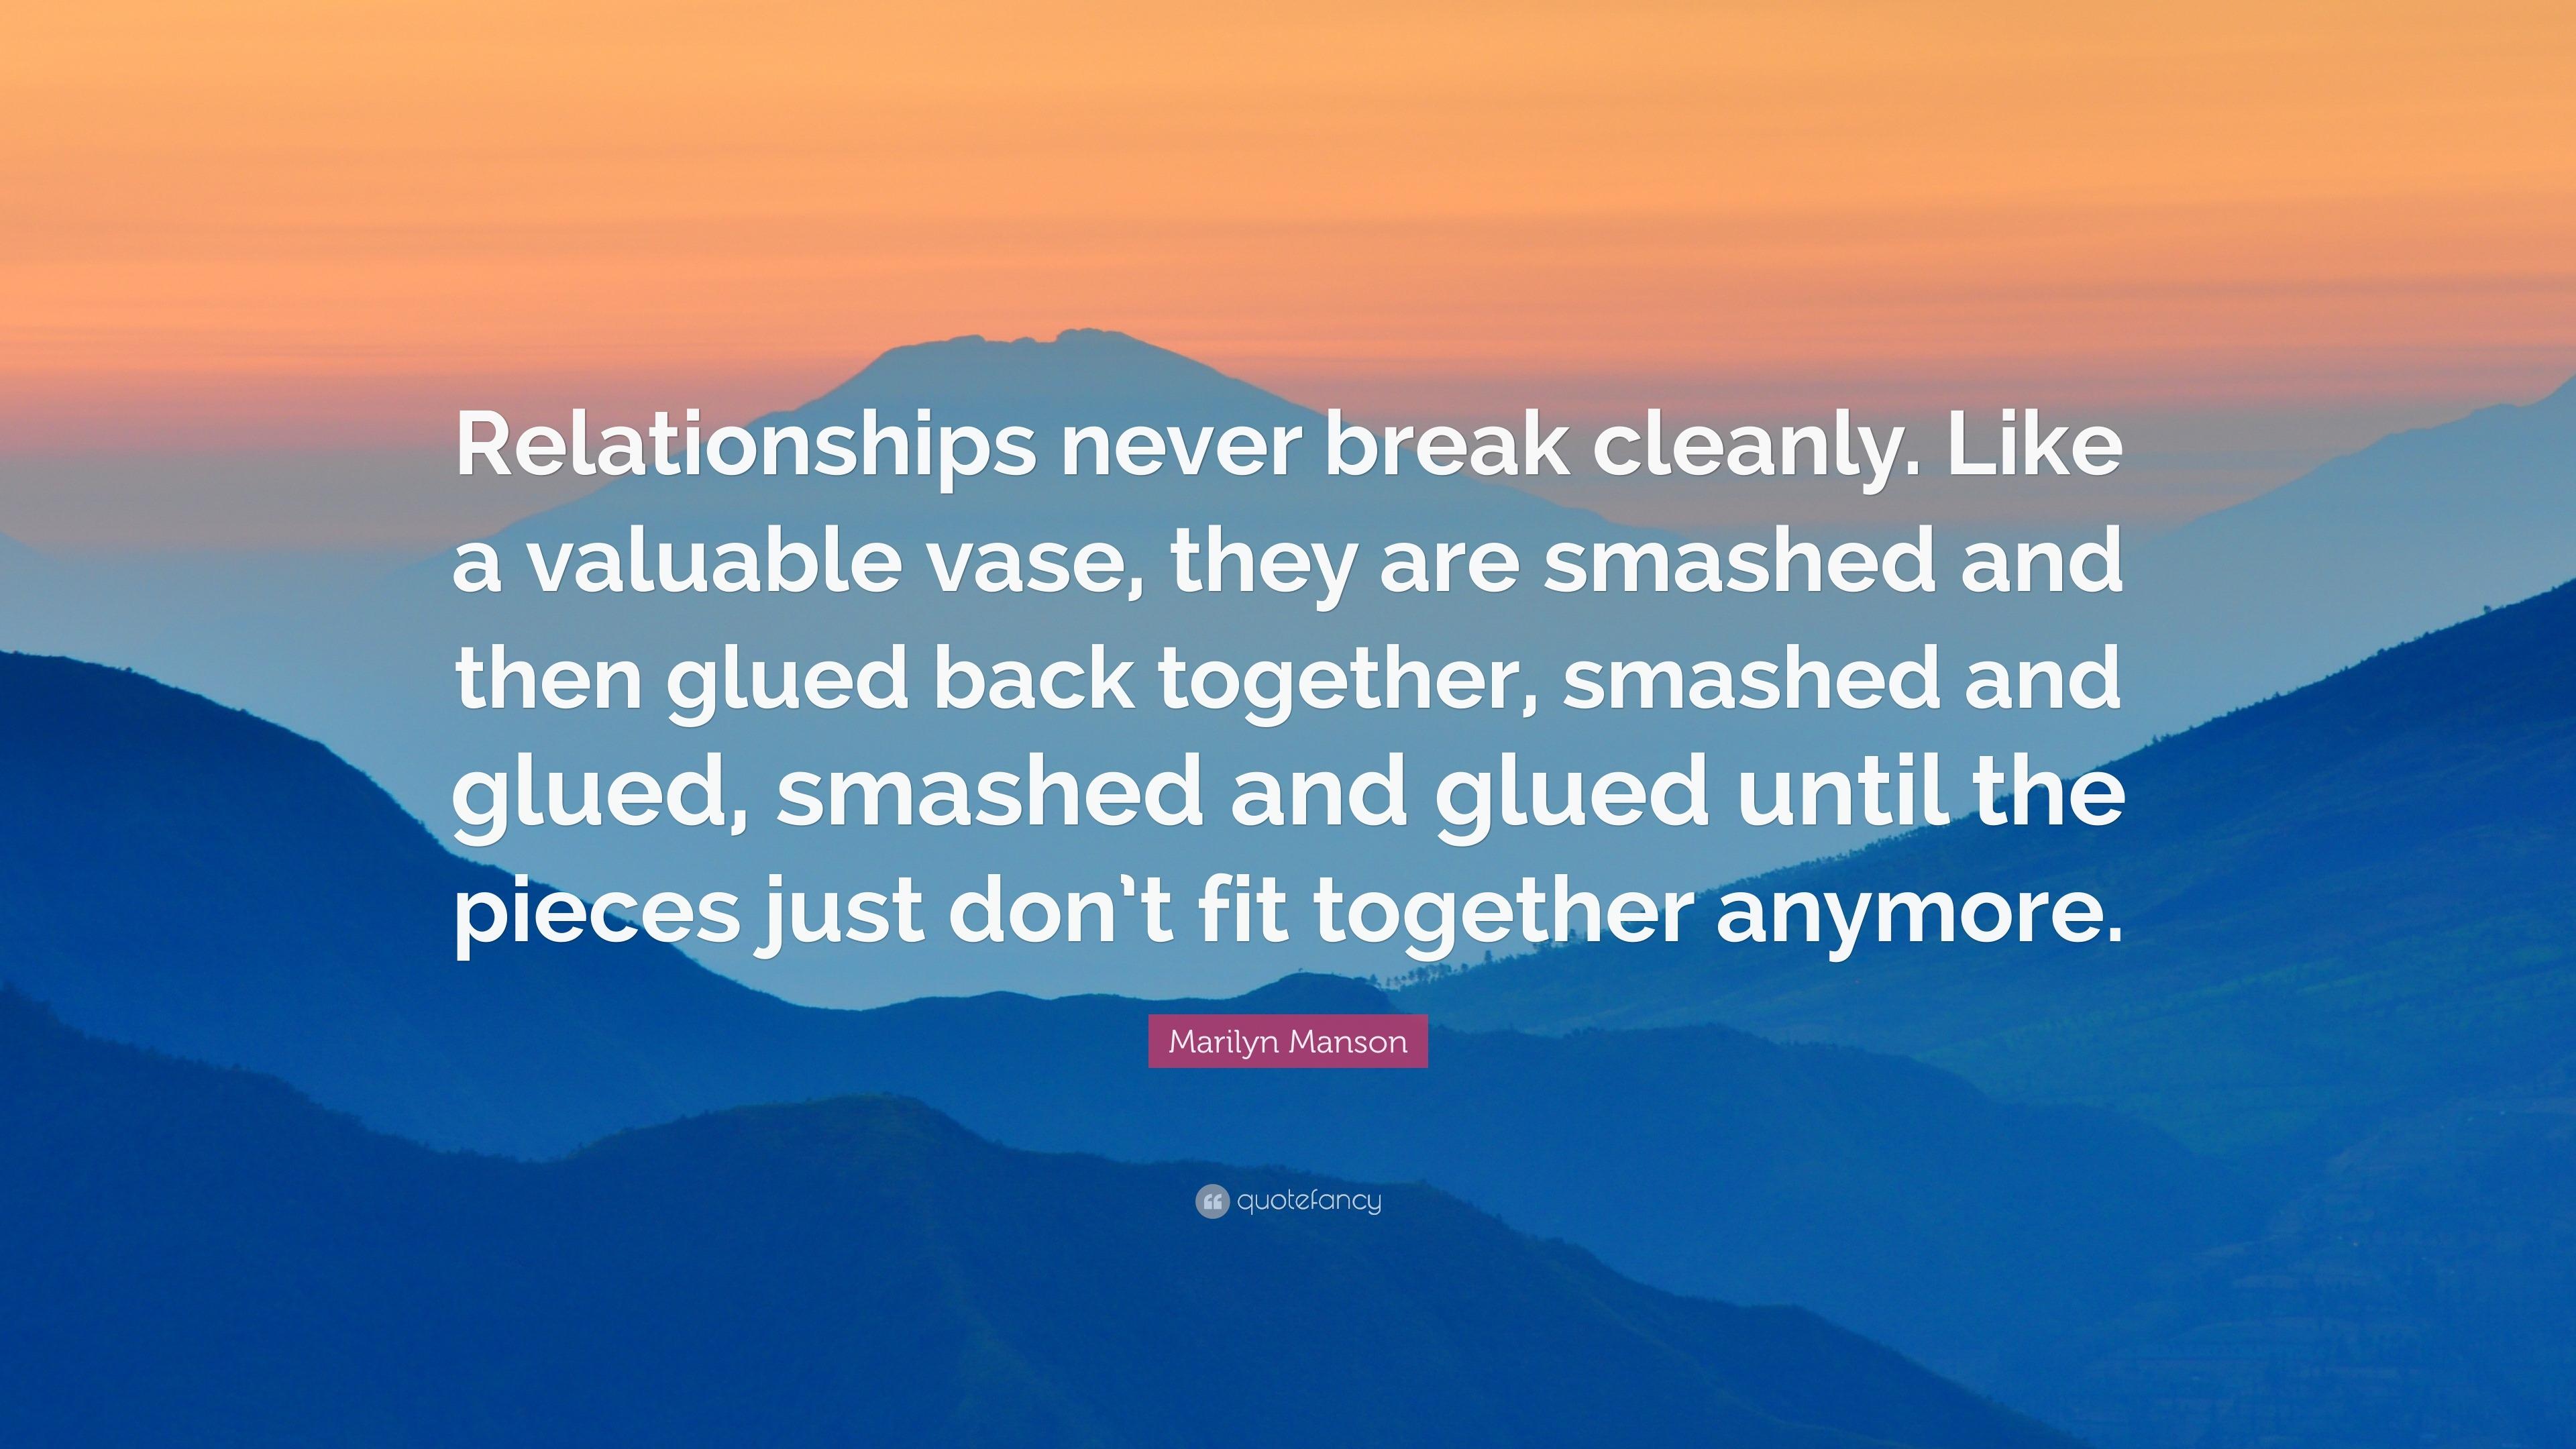 Former relationship, glue or break 30